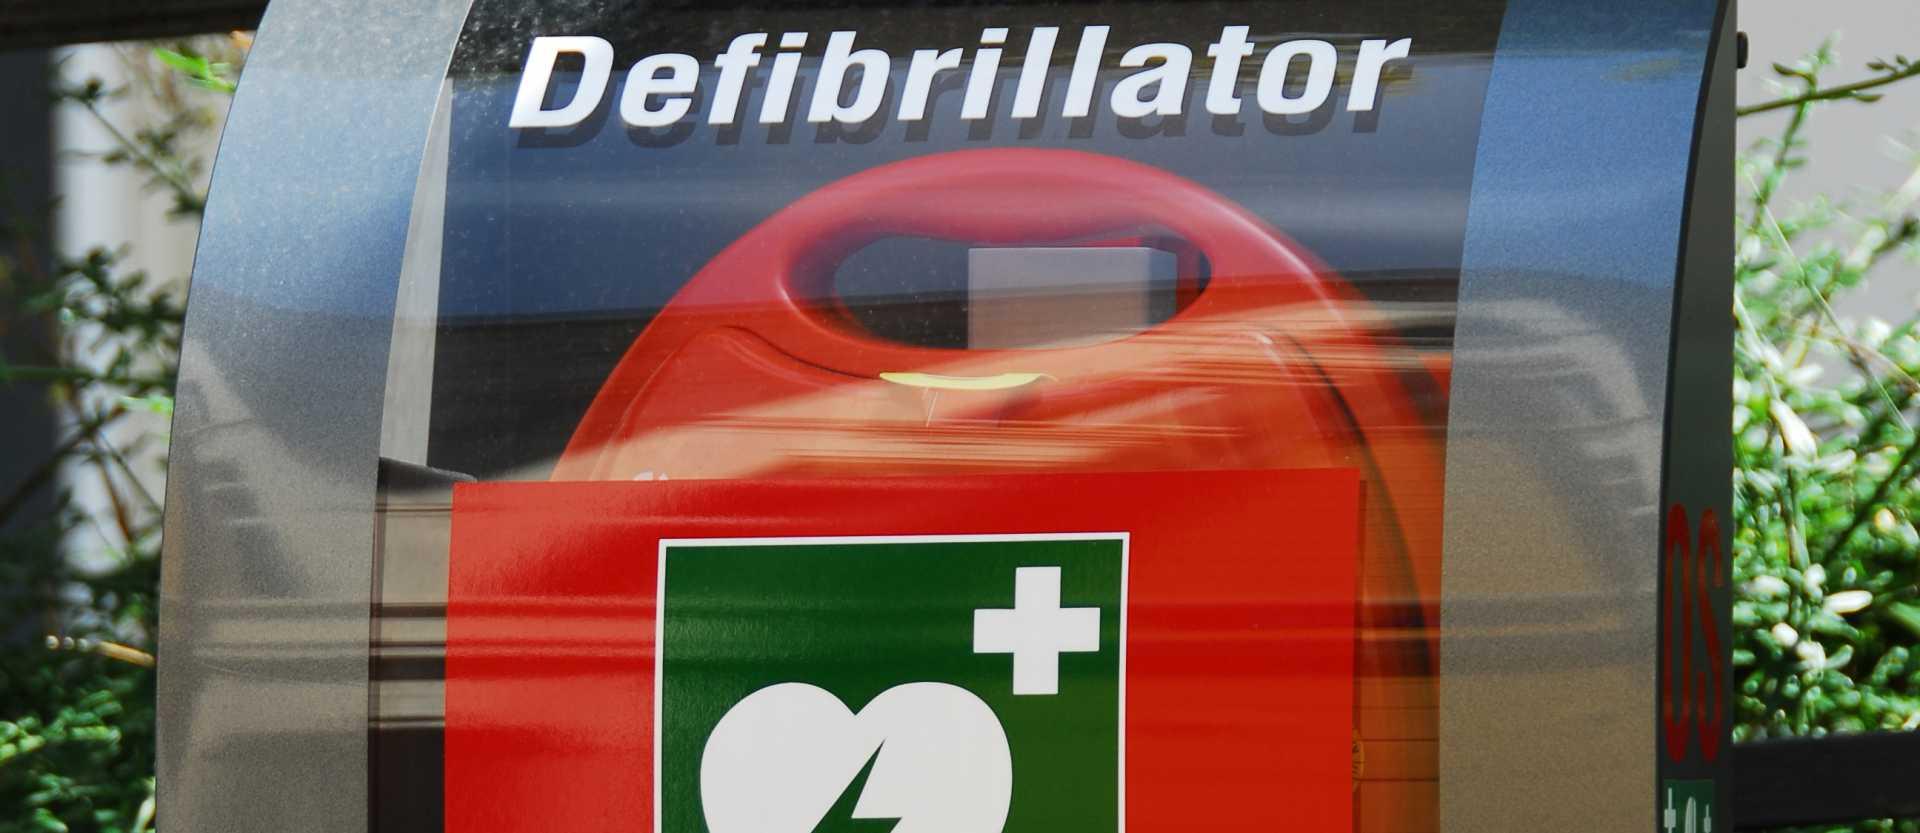 Defibirillator